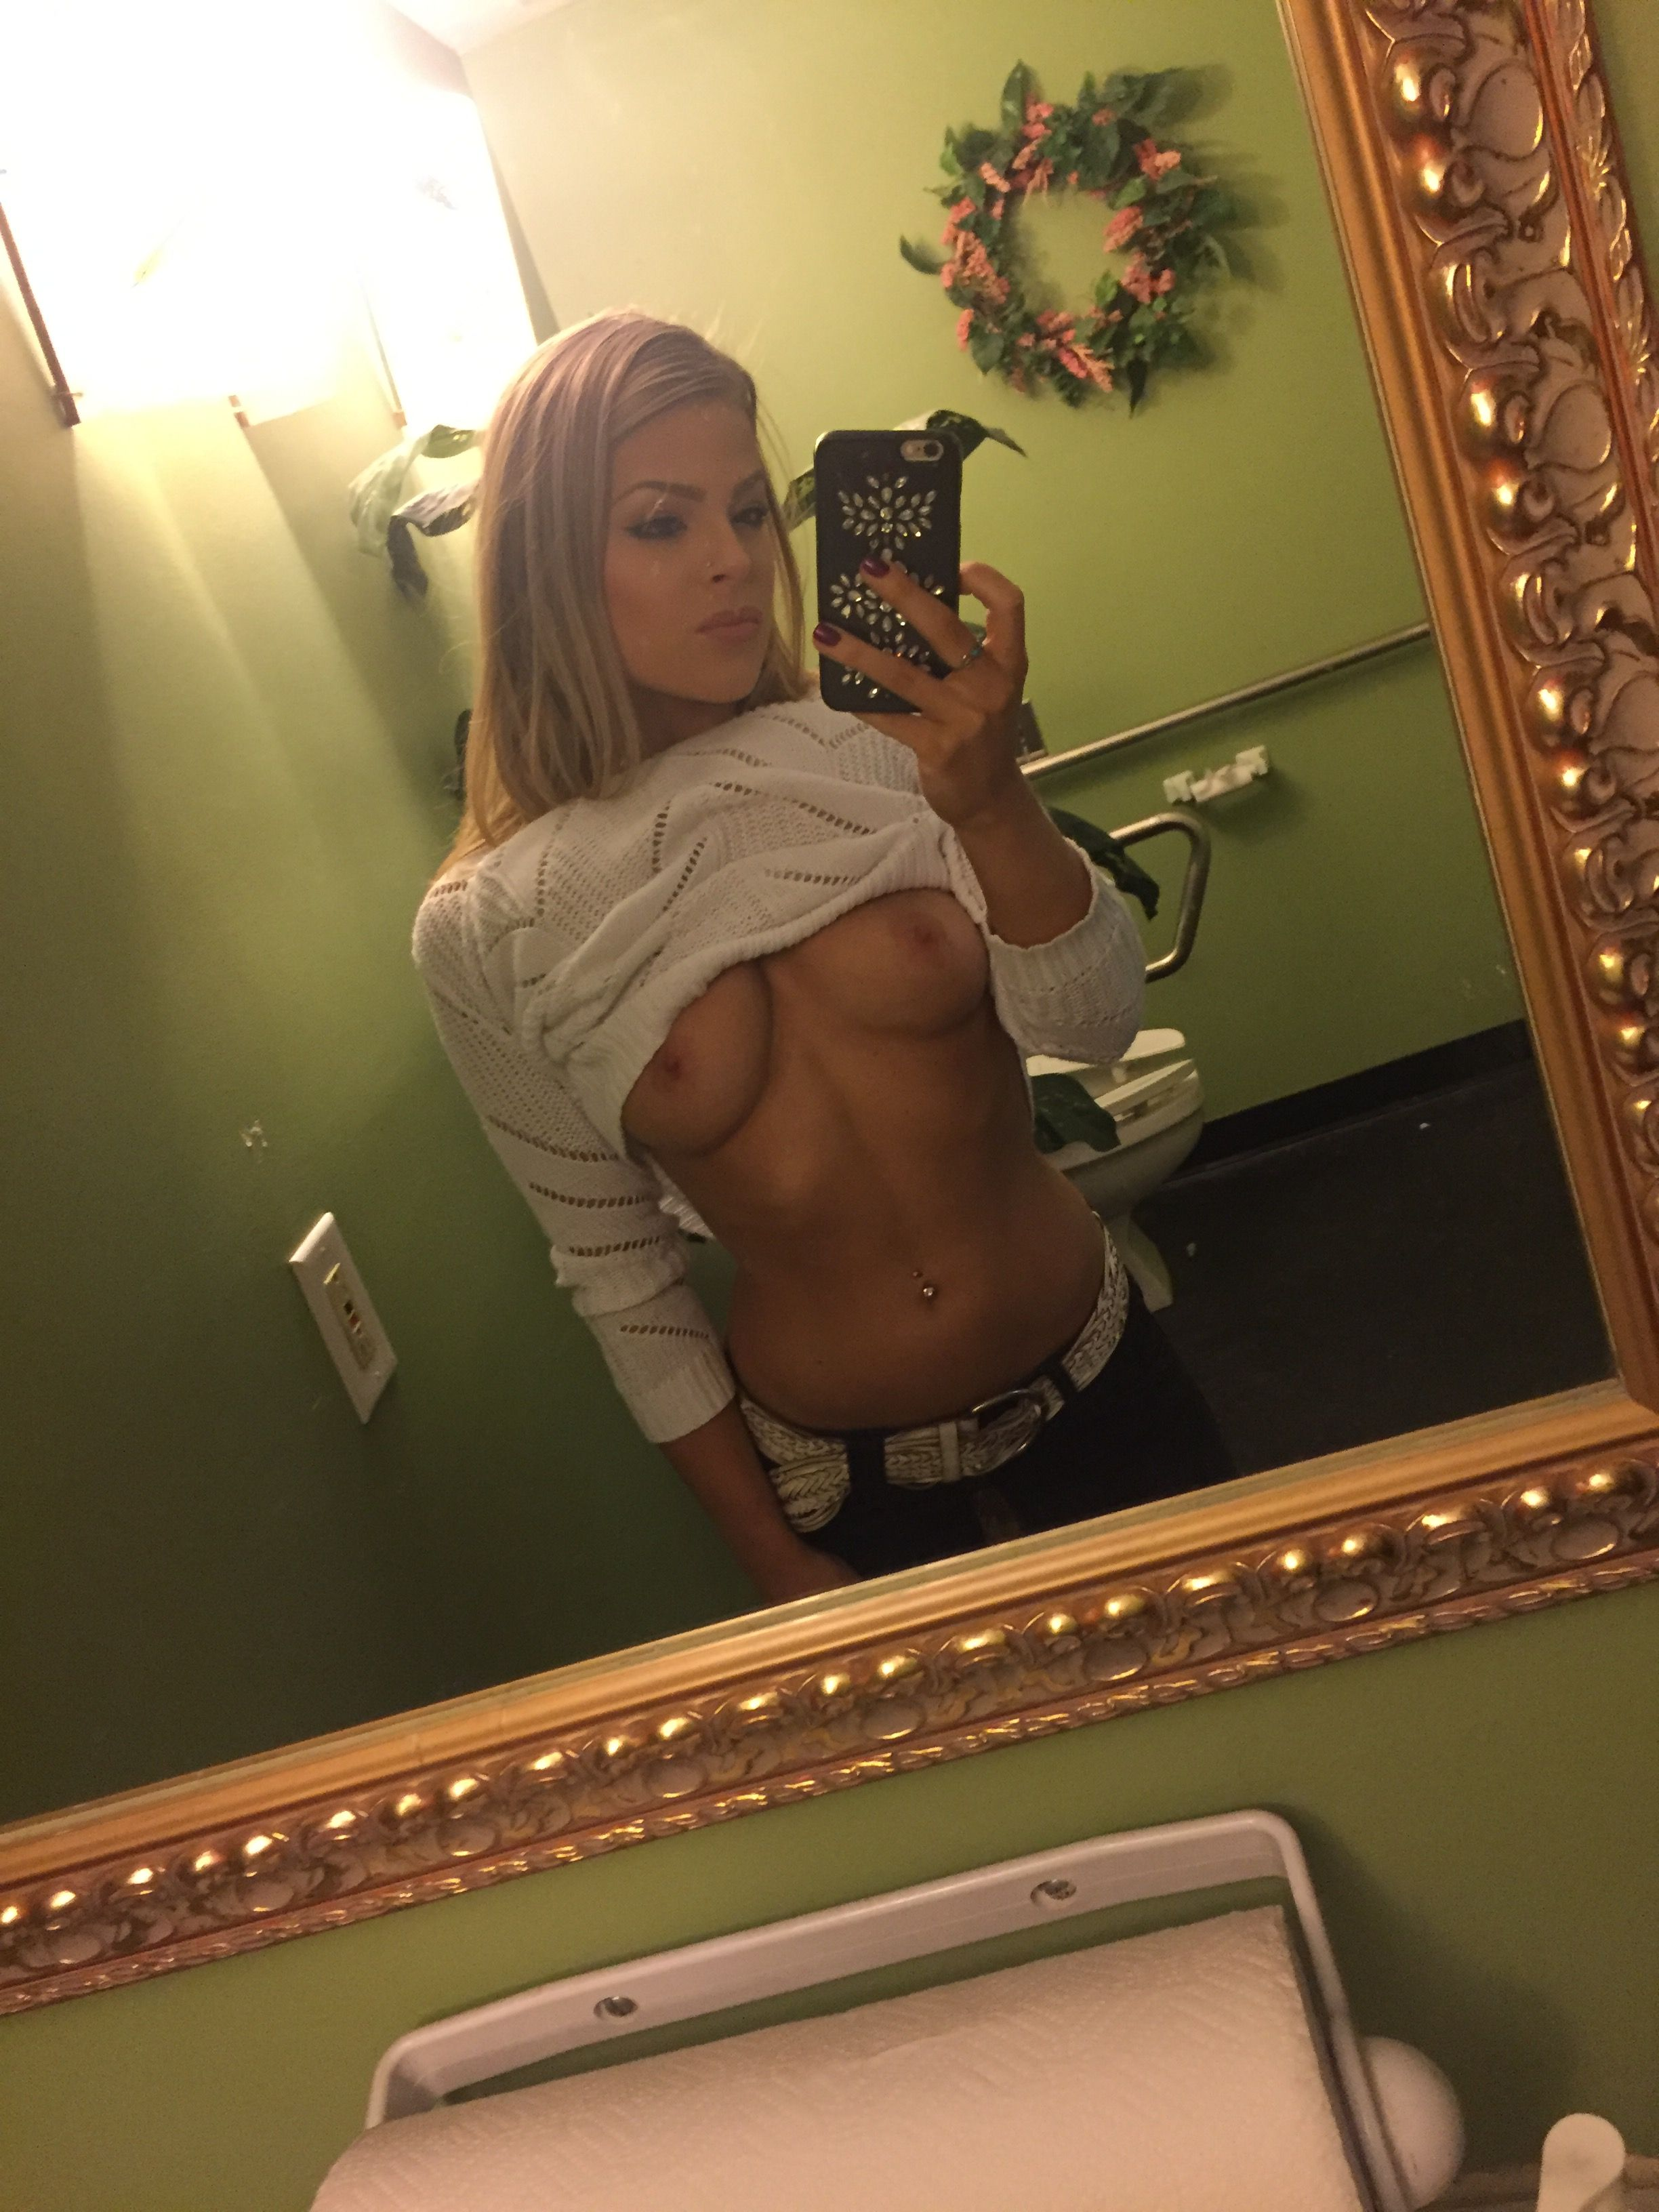 Valerie Pac Leaked Nude